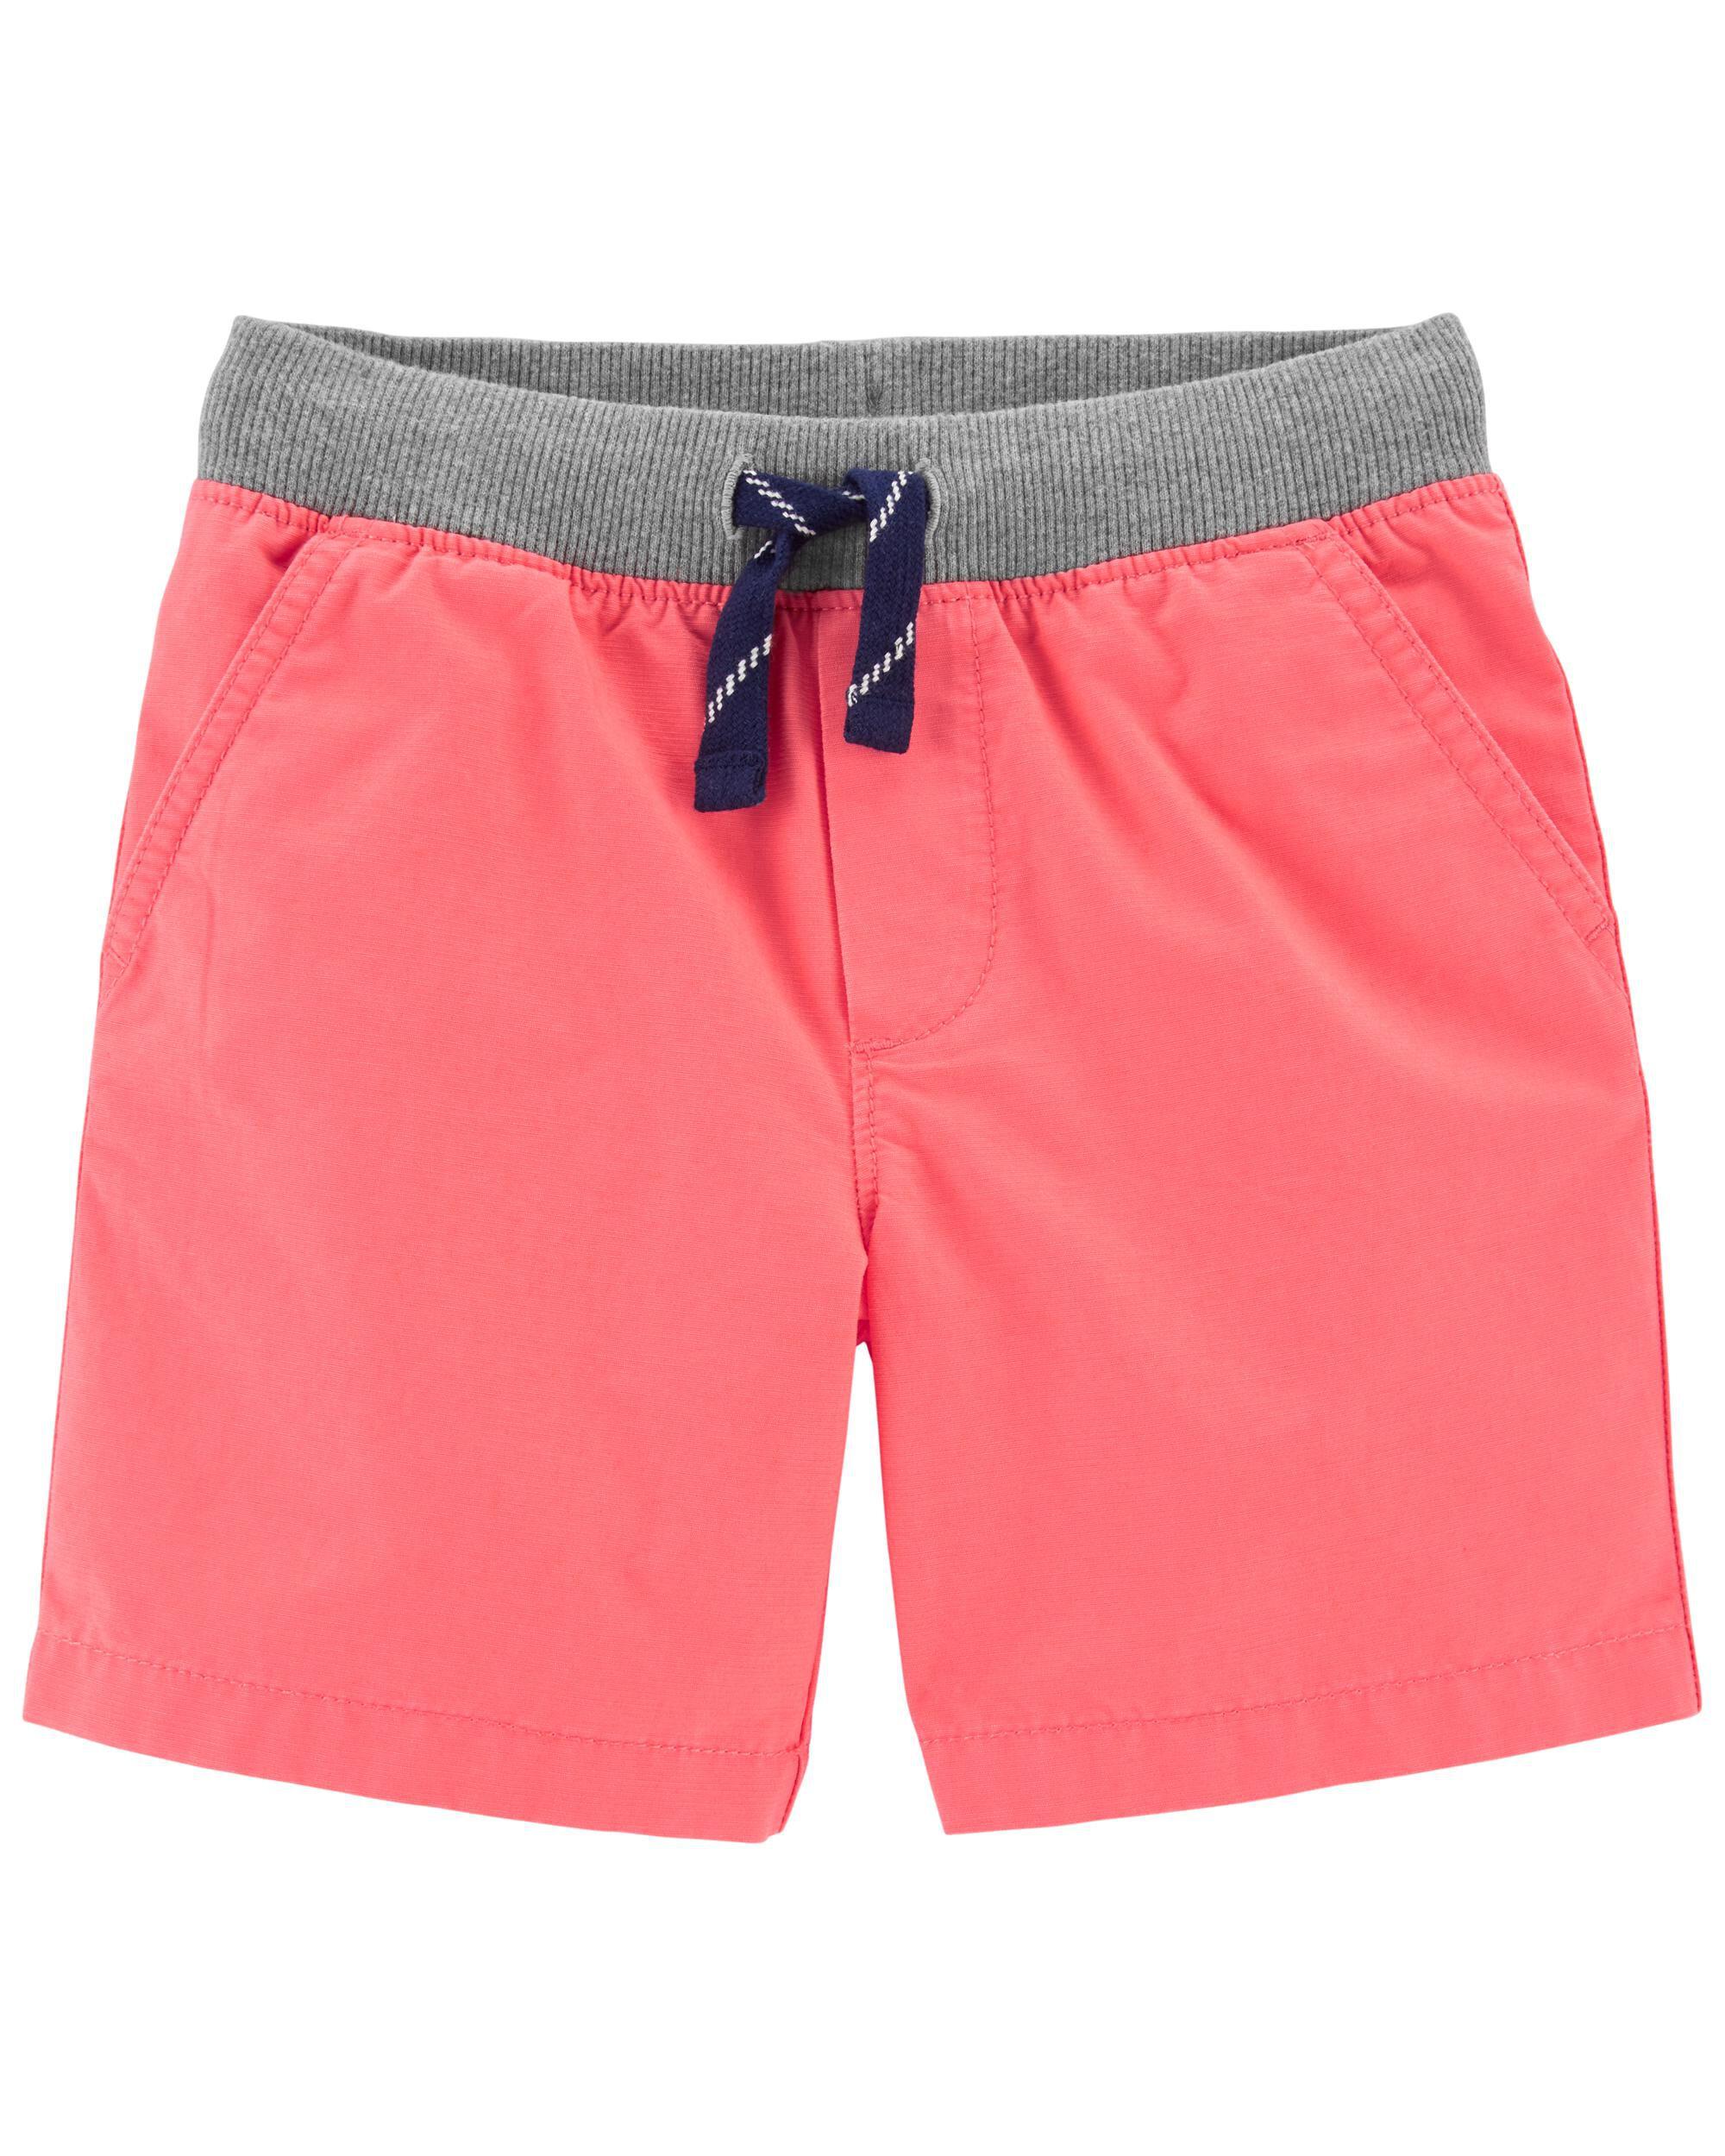 *DOORBUSTER* Easy Pull-On Dock Shorts